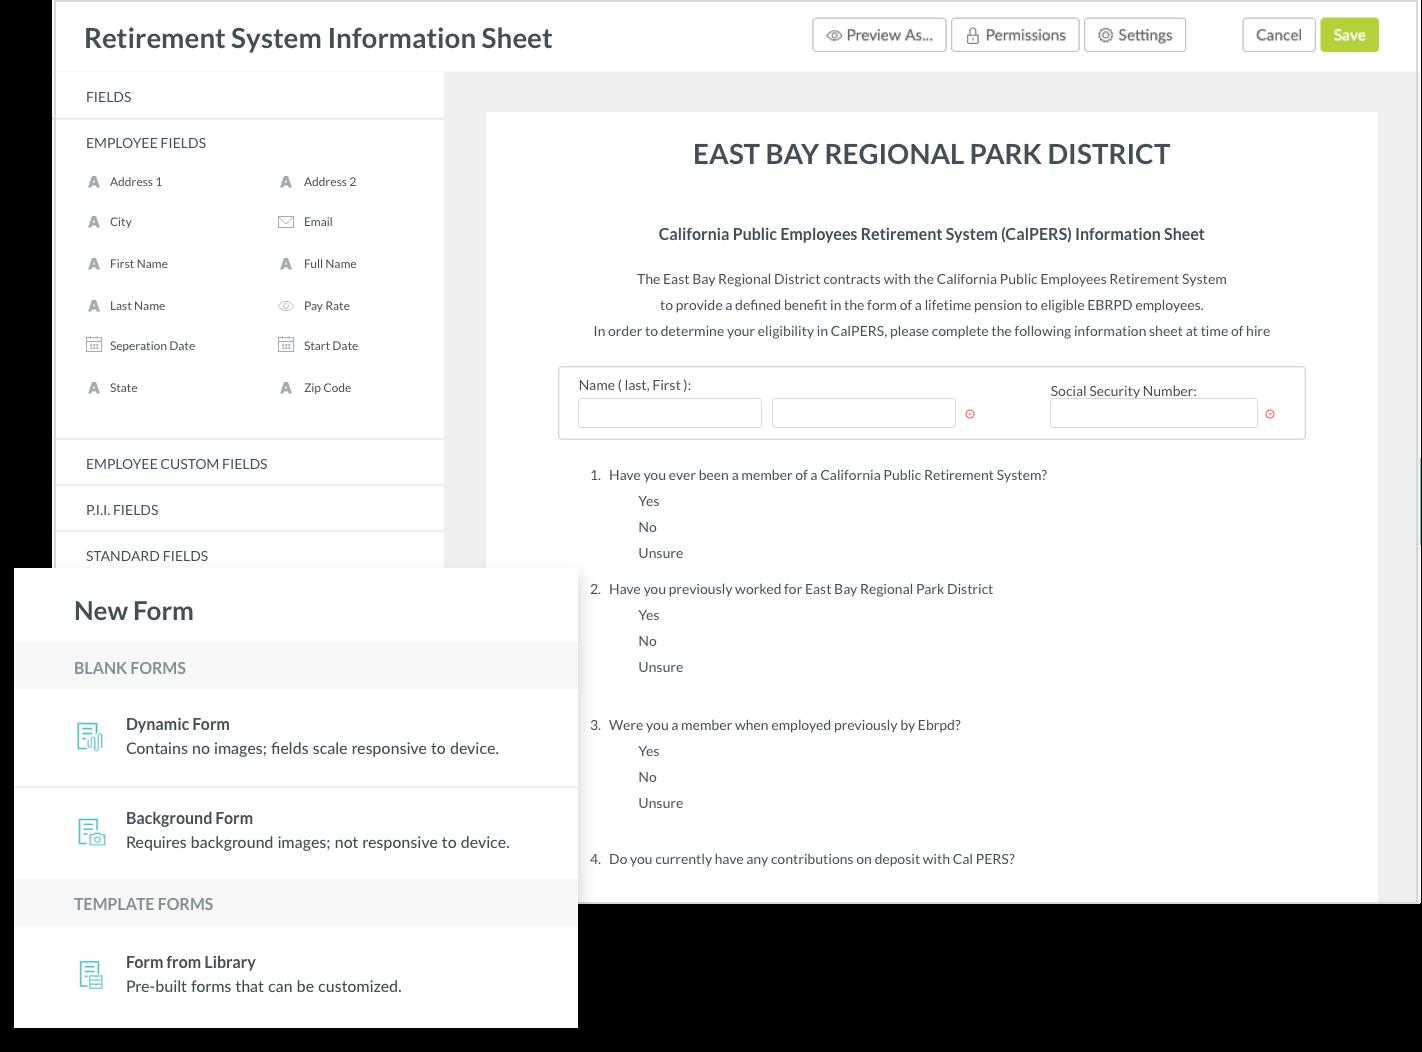 Retirement system information sheet